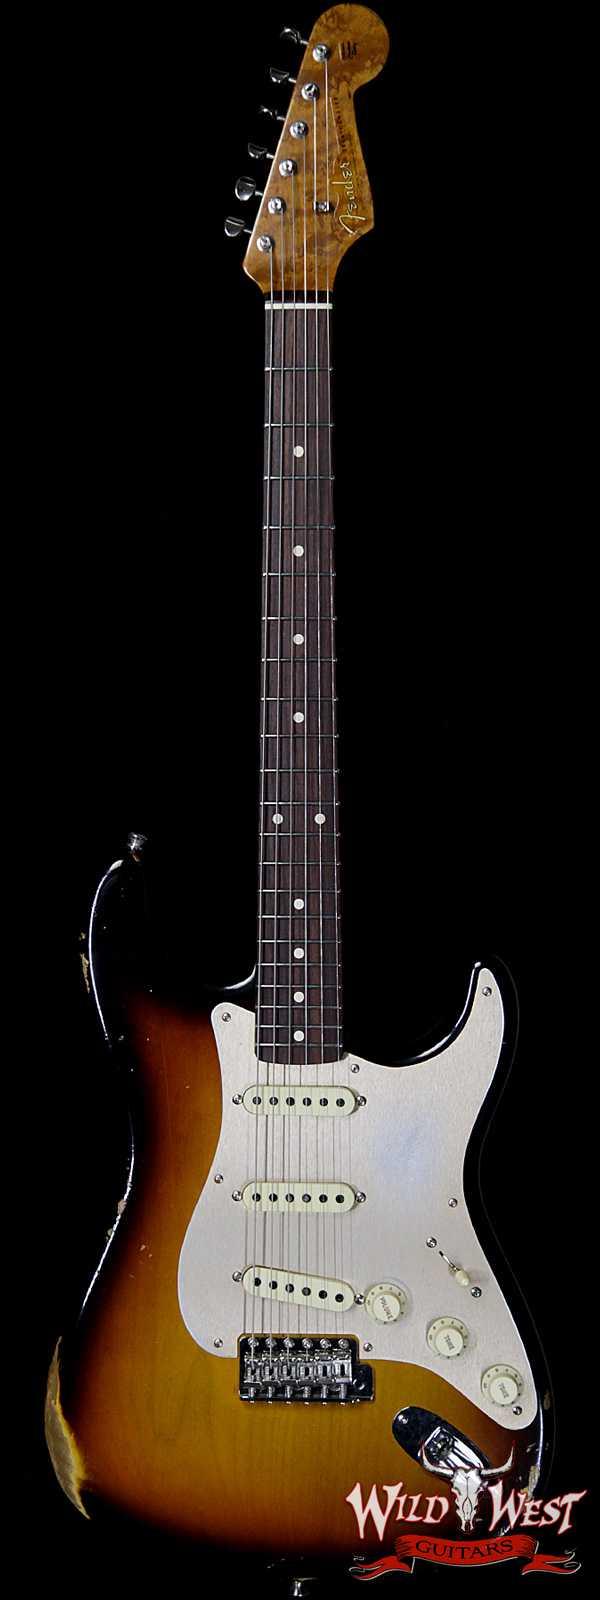 Fender Custom Shop Roasted 1960 Stratocaster Birdseye Maple Neck Slab 3A Rosewood Board Relic 3 Tone Sunburst